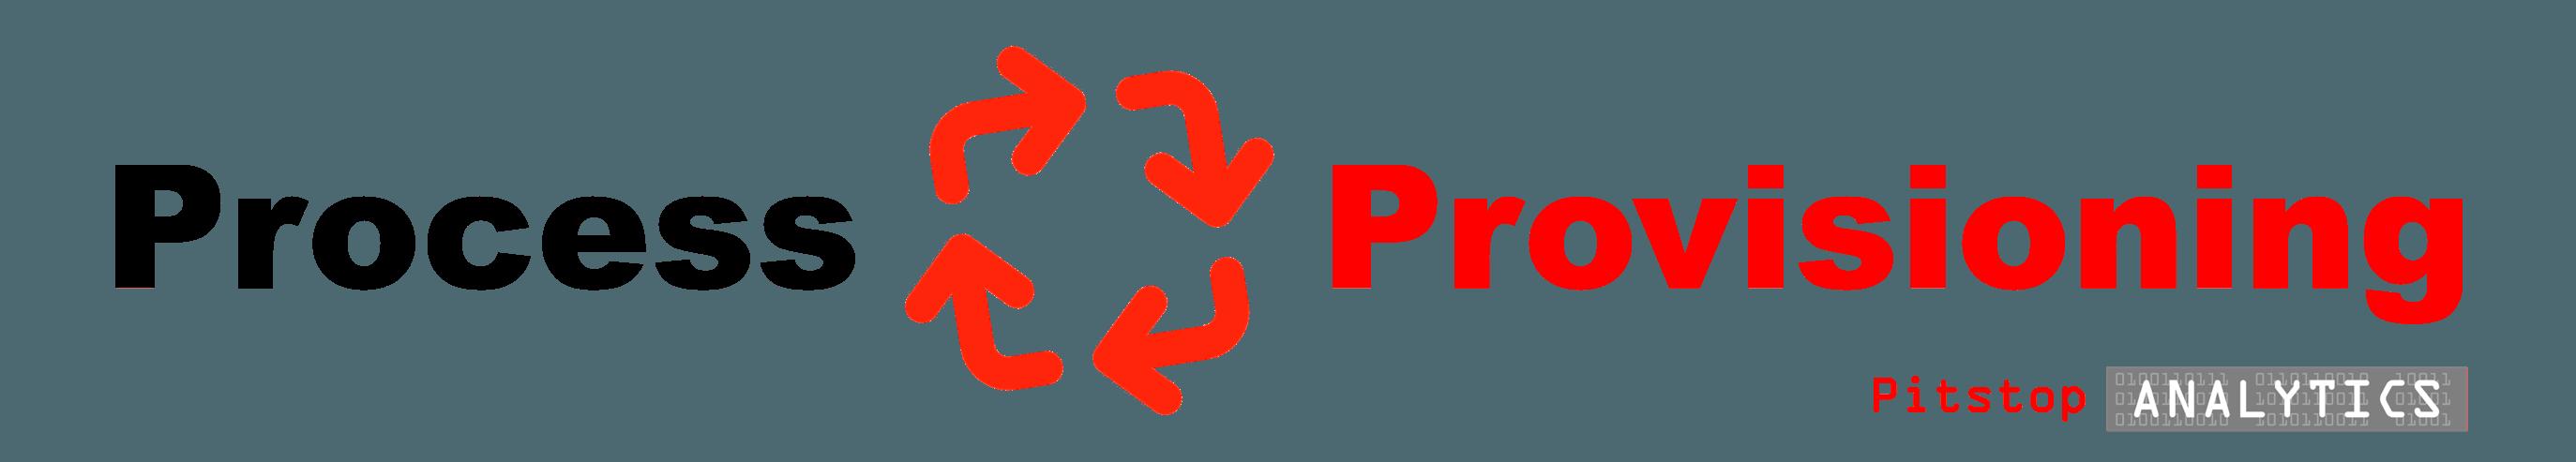 provisioning process